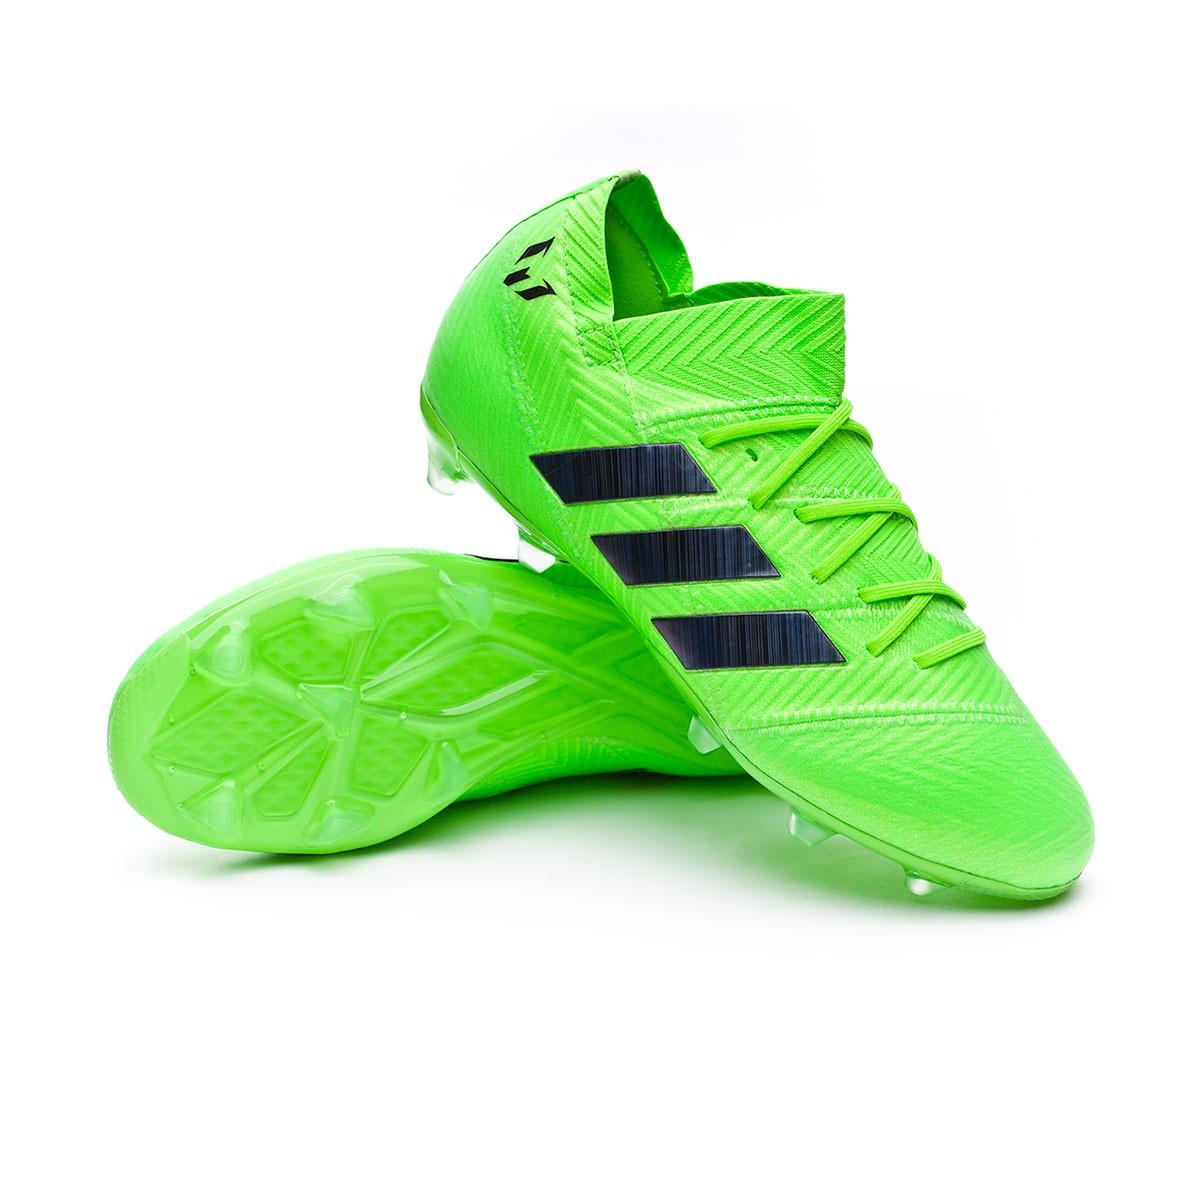 c1587dd691e Football Boots adidas Kids Nemeziz Messi 18.1 FG Solar green-Black ...